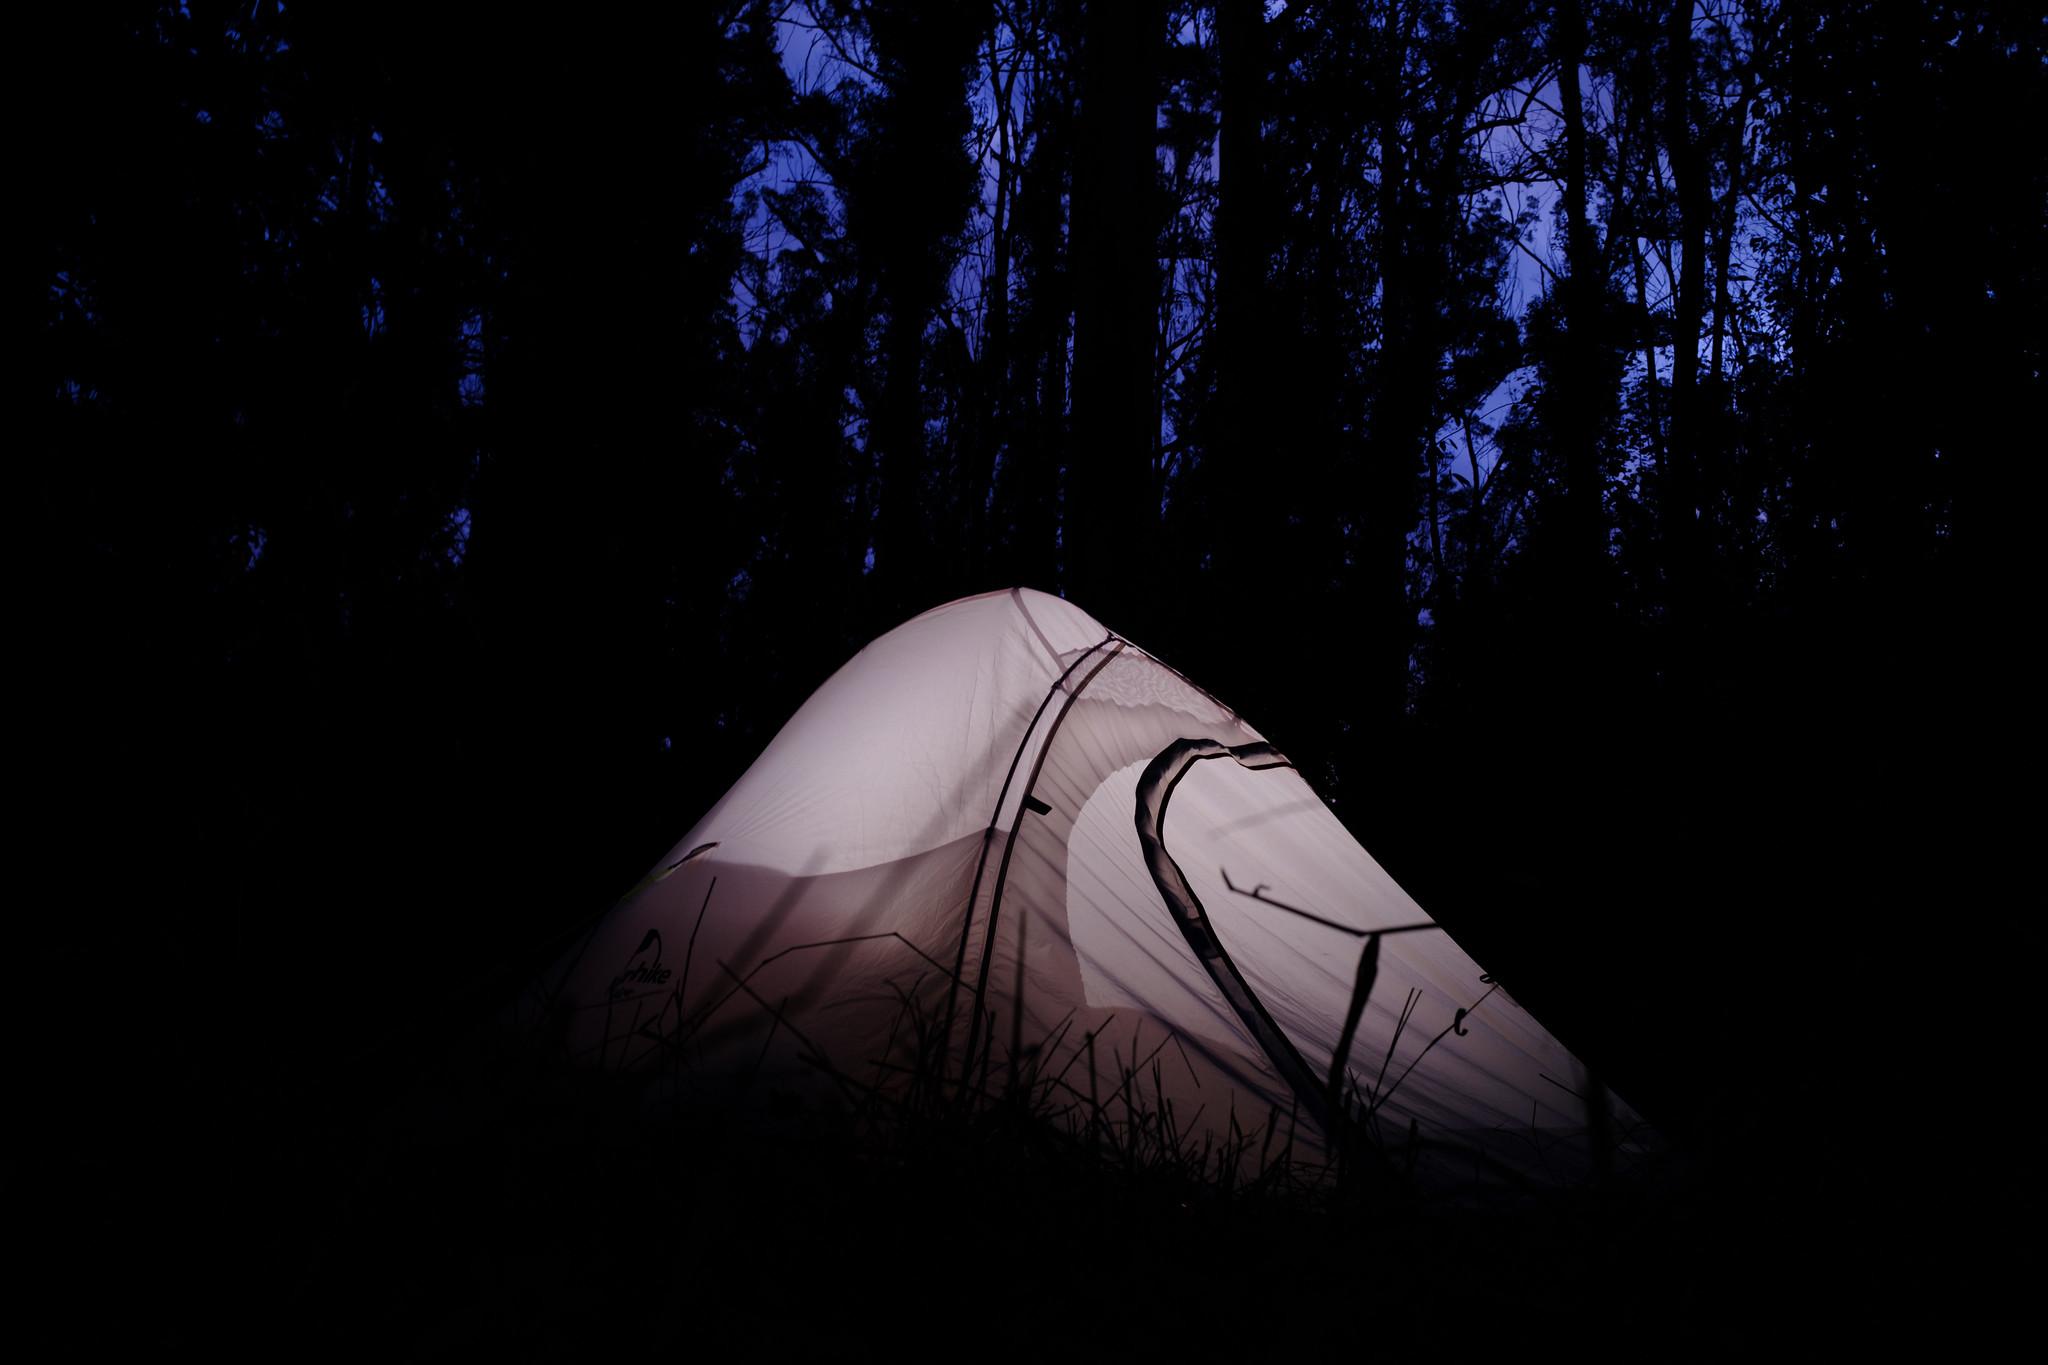 Acacia Flat Campground